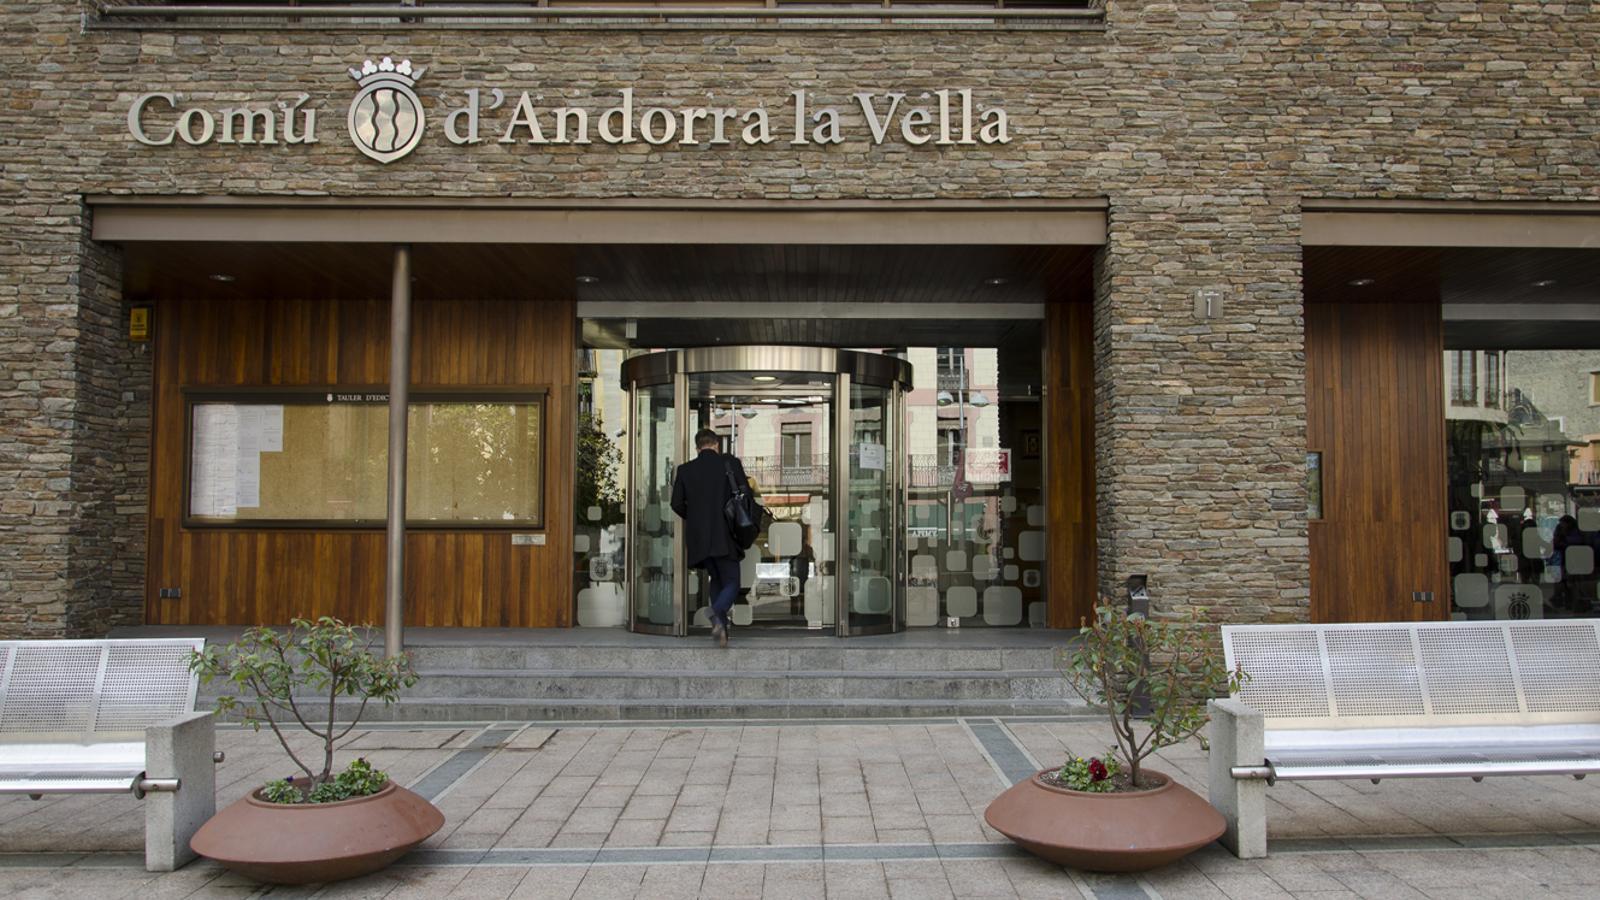 Edifici del comú d'Andorra la Vella. / ARXIU ANA